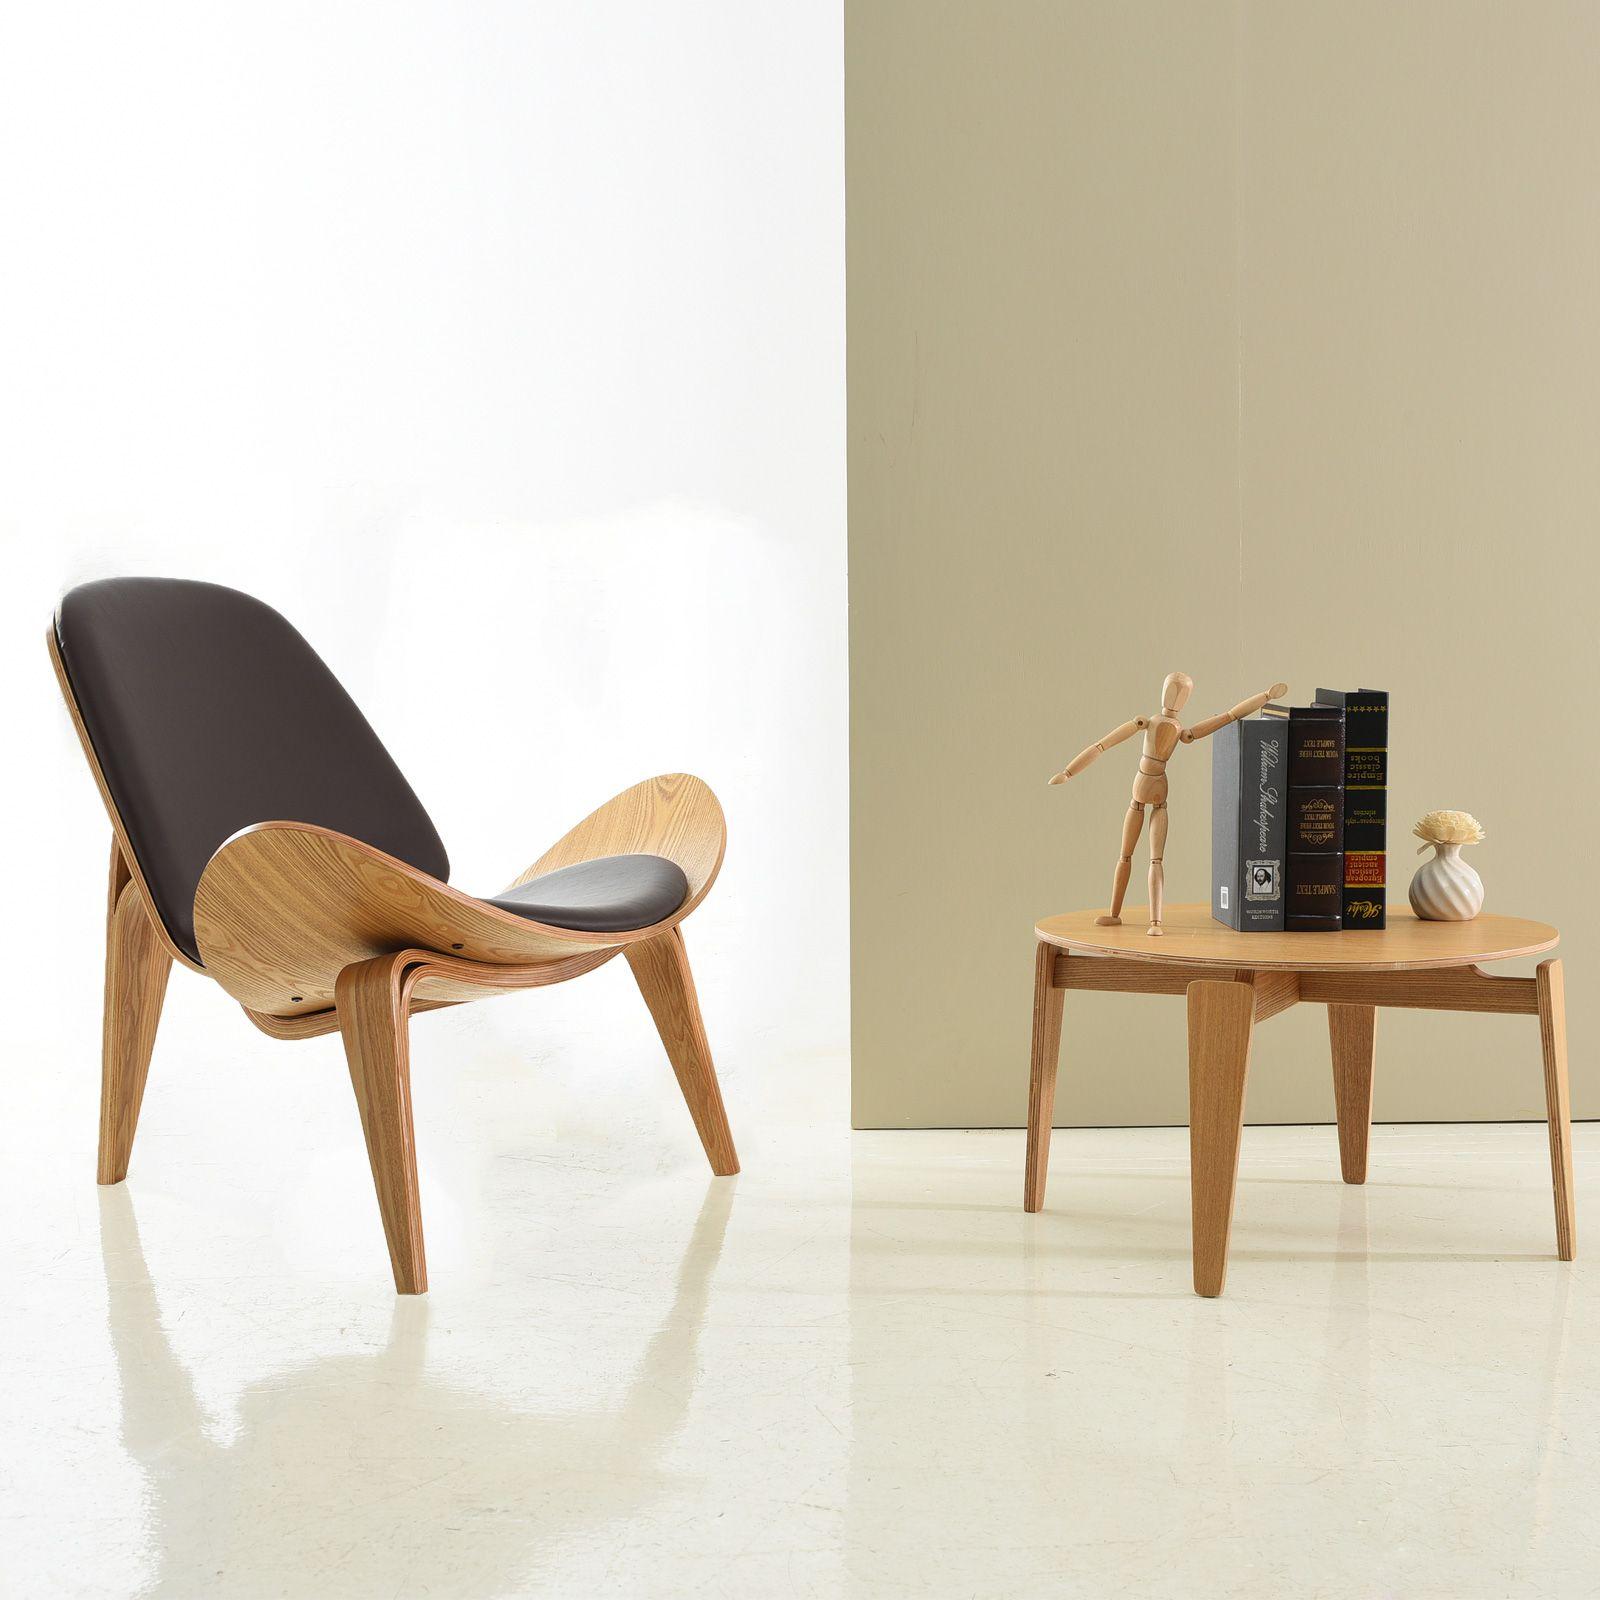 NICO | Butaca de madera contrachapada con cojín gris oscuro (82 x 89 x 74 cm)